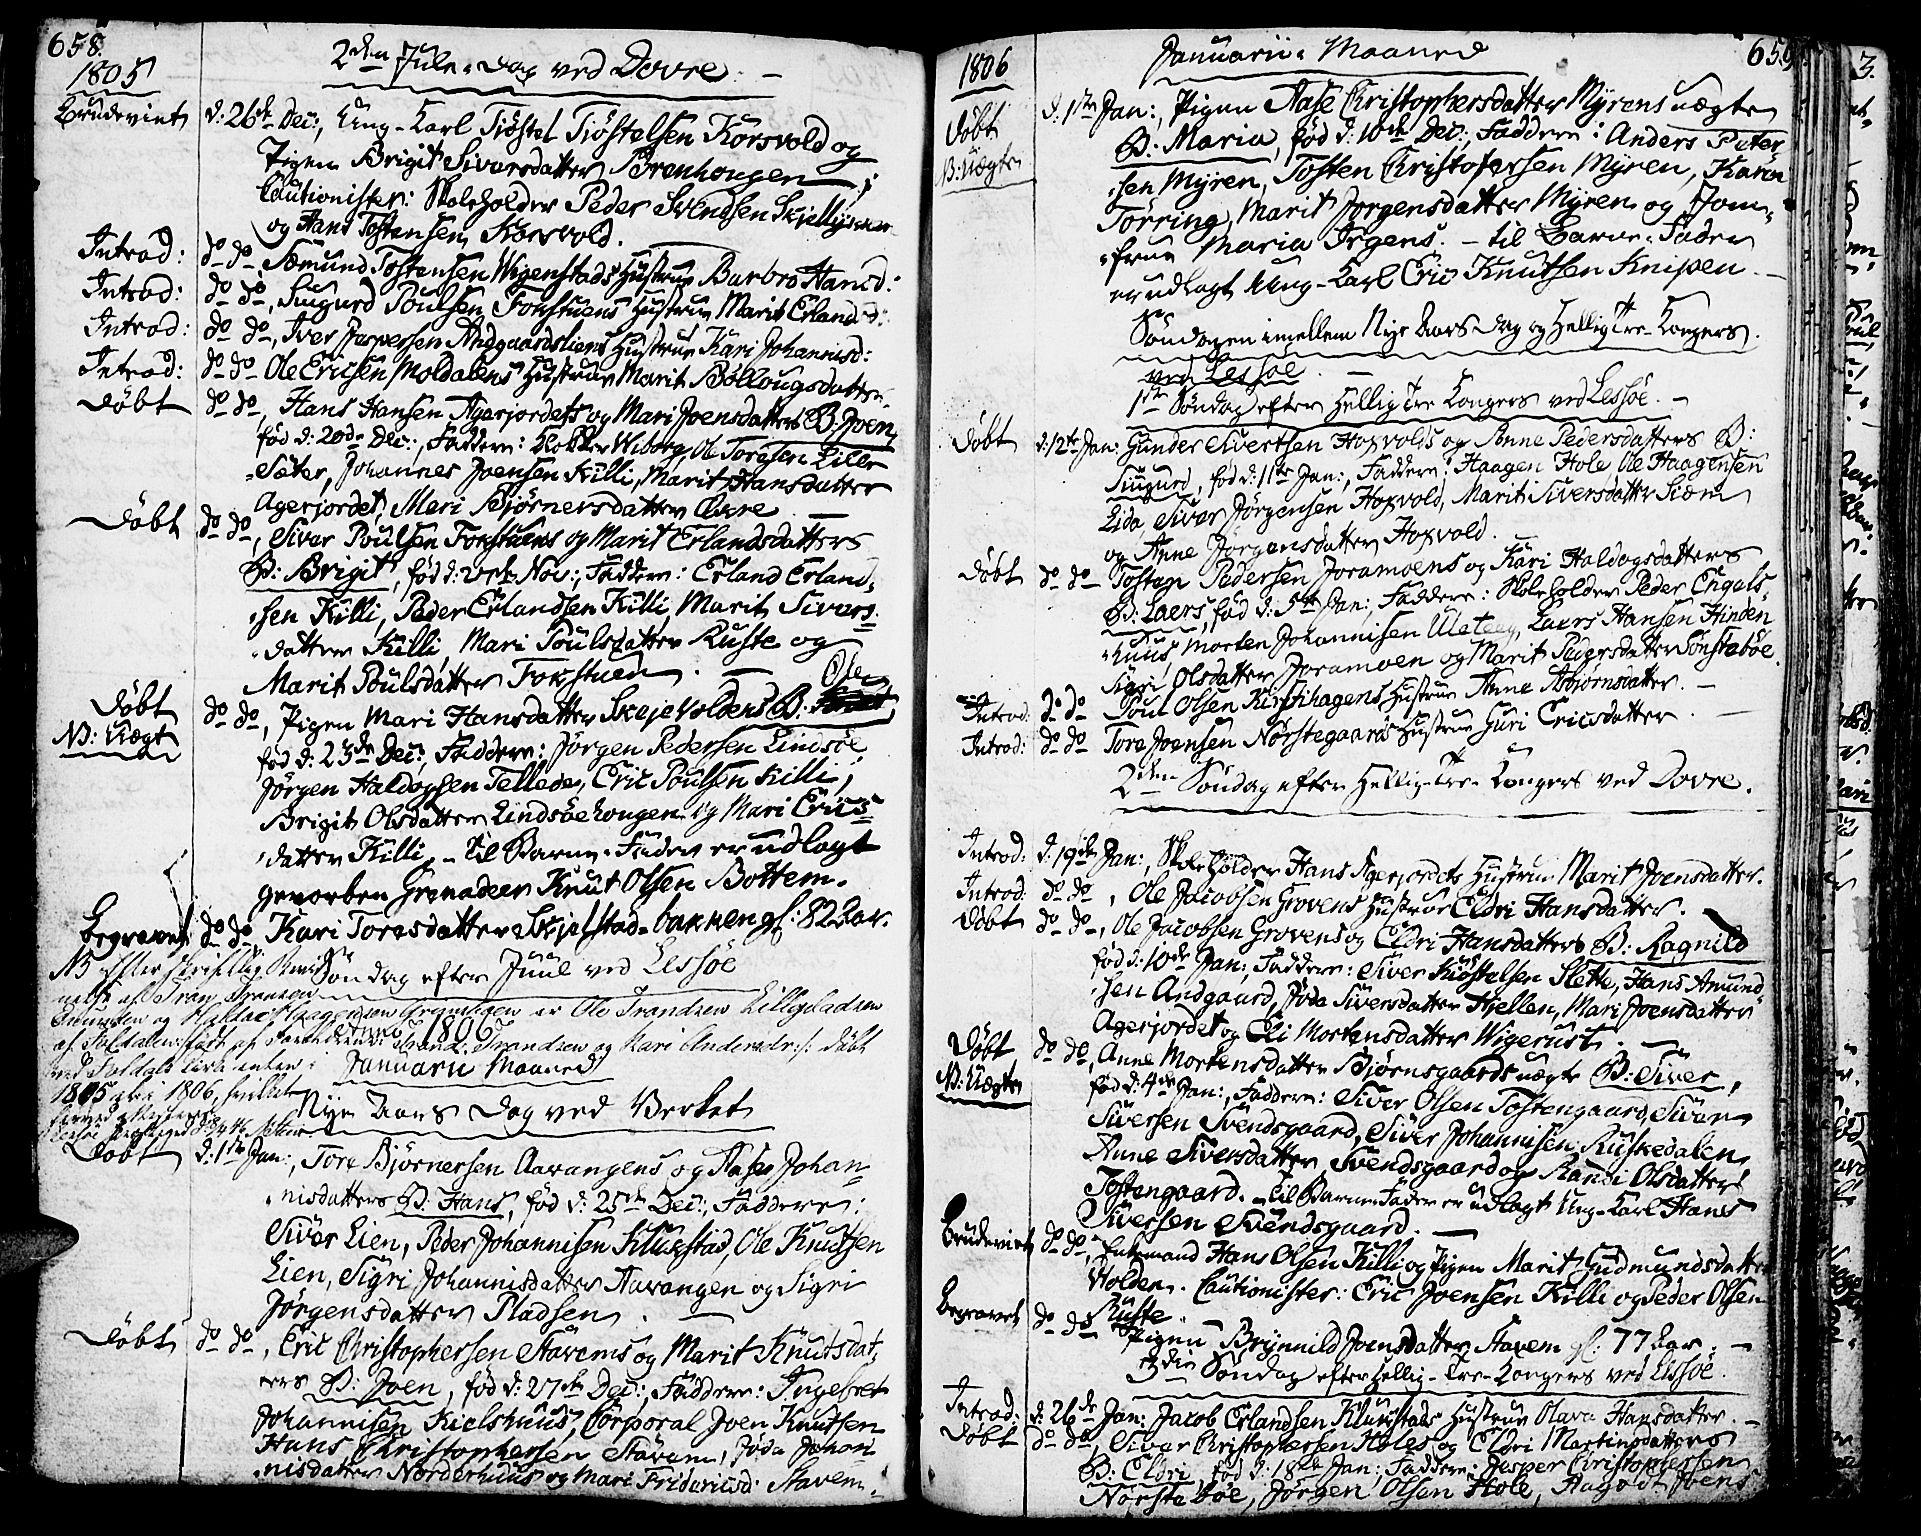 SAH, Lesja prestekontor, Ministerialbok nr. 3, 1777-1819, s. 658-659